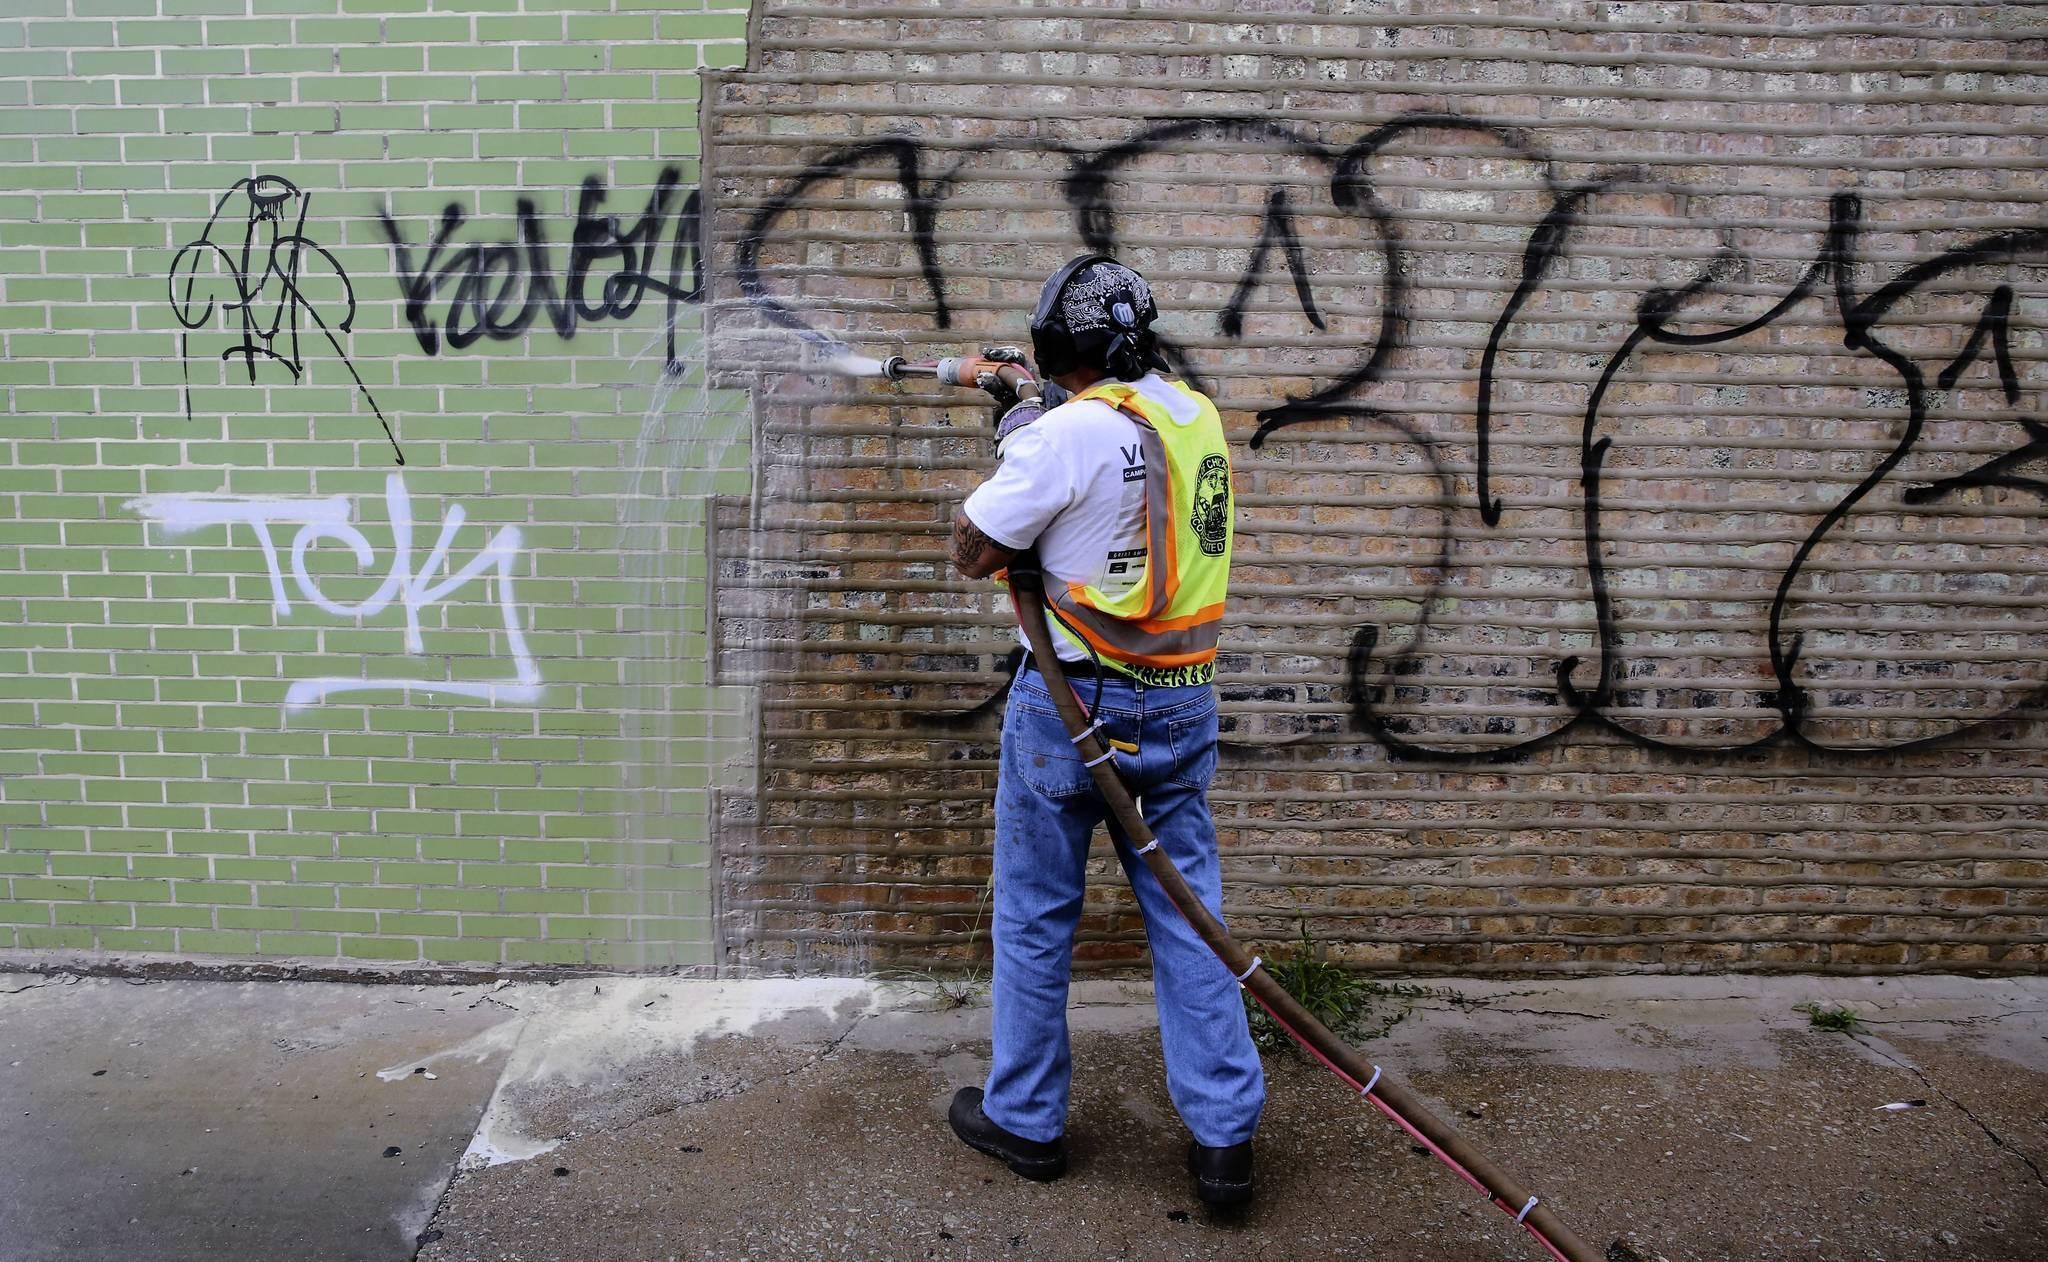 Emanuel touts graffiti removal efficiency chicago tribune